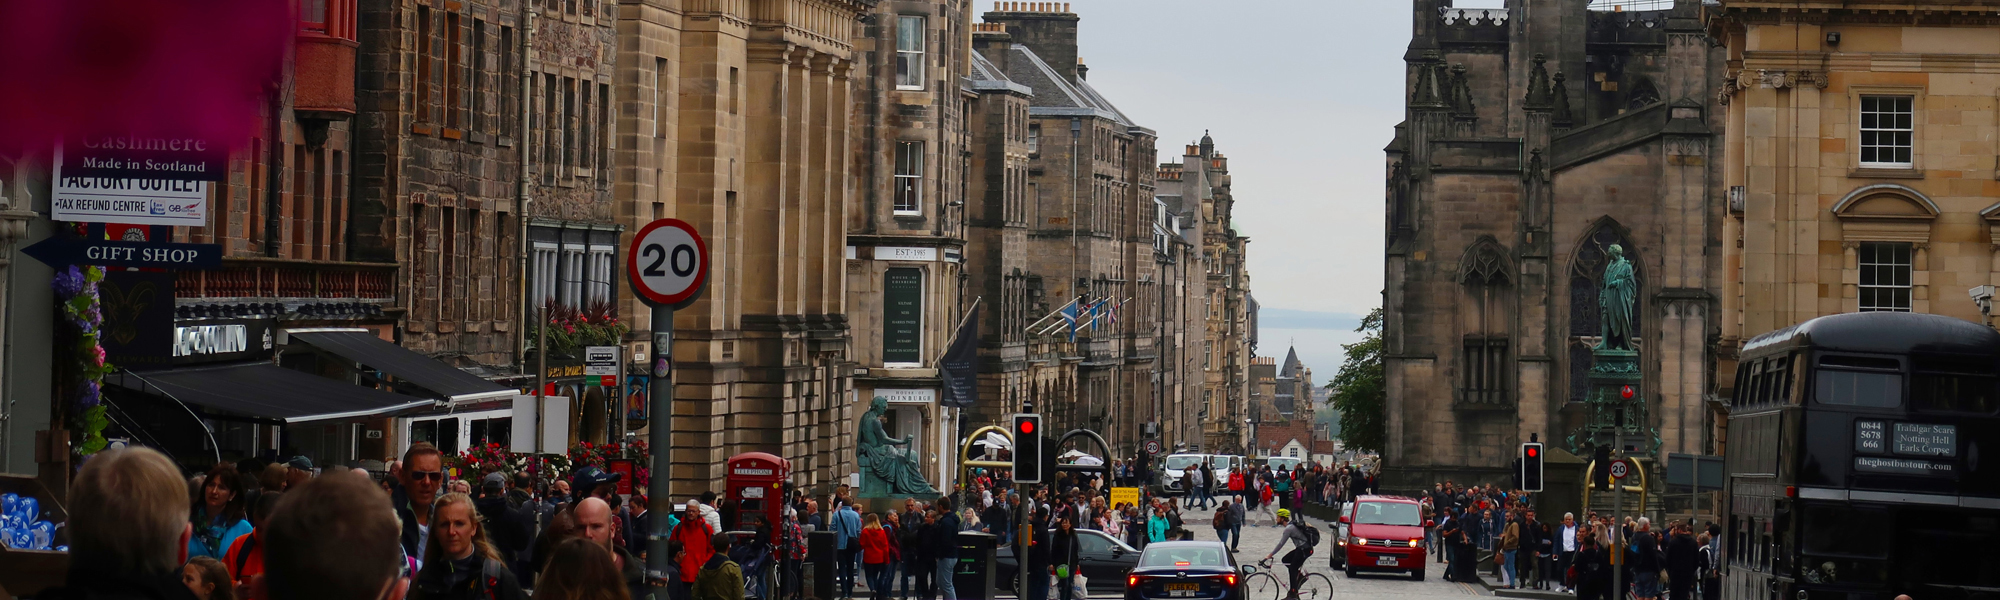 Edinburgh street, Photo by Emran Yousof on Unsplash